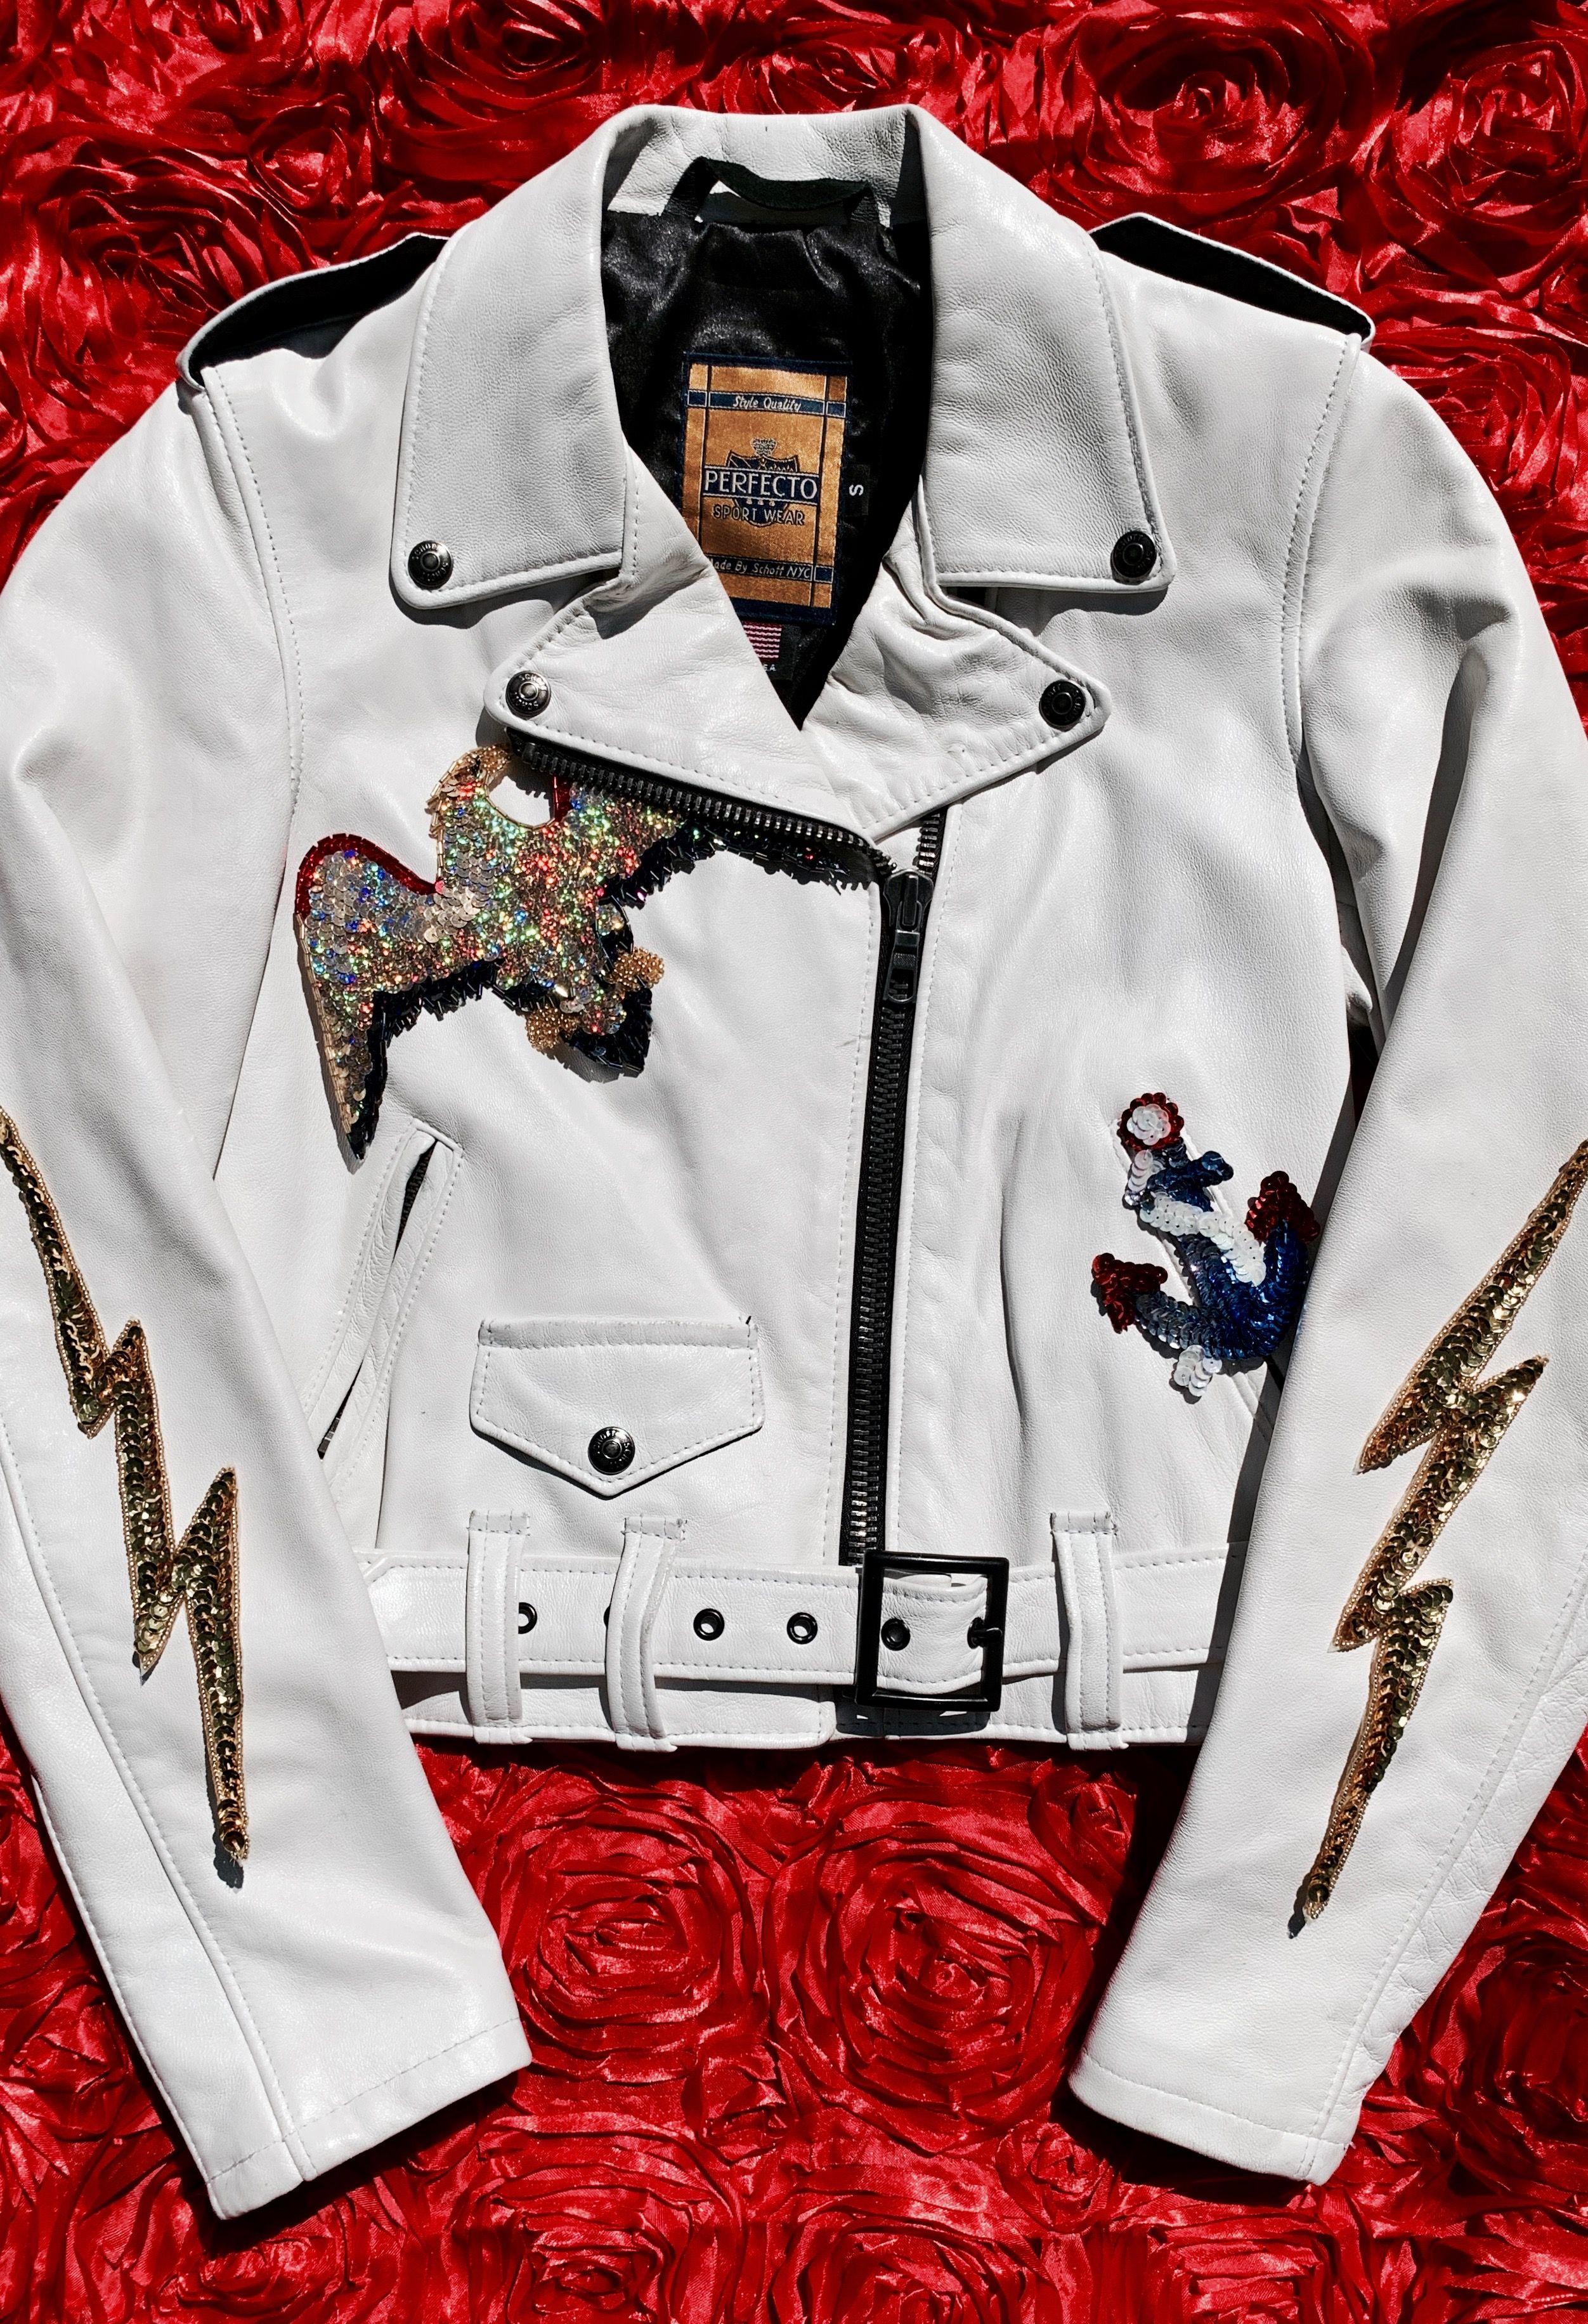 parrot sequins patch applique embroidery patches for clothes t-shirt jeans MC